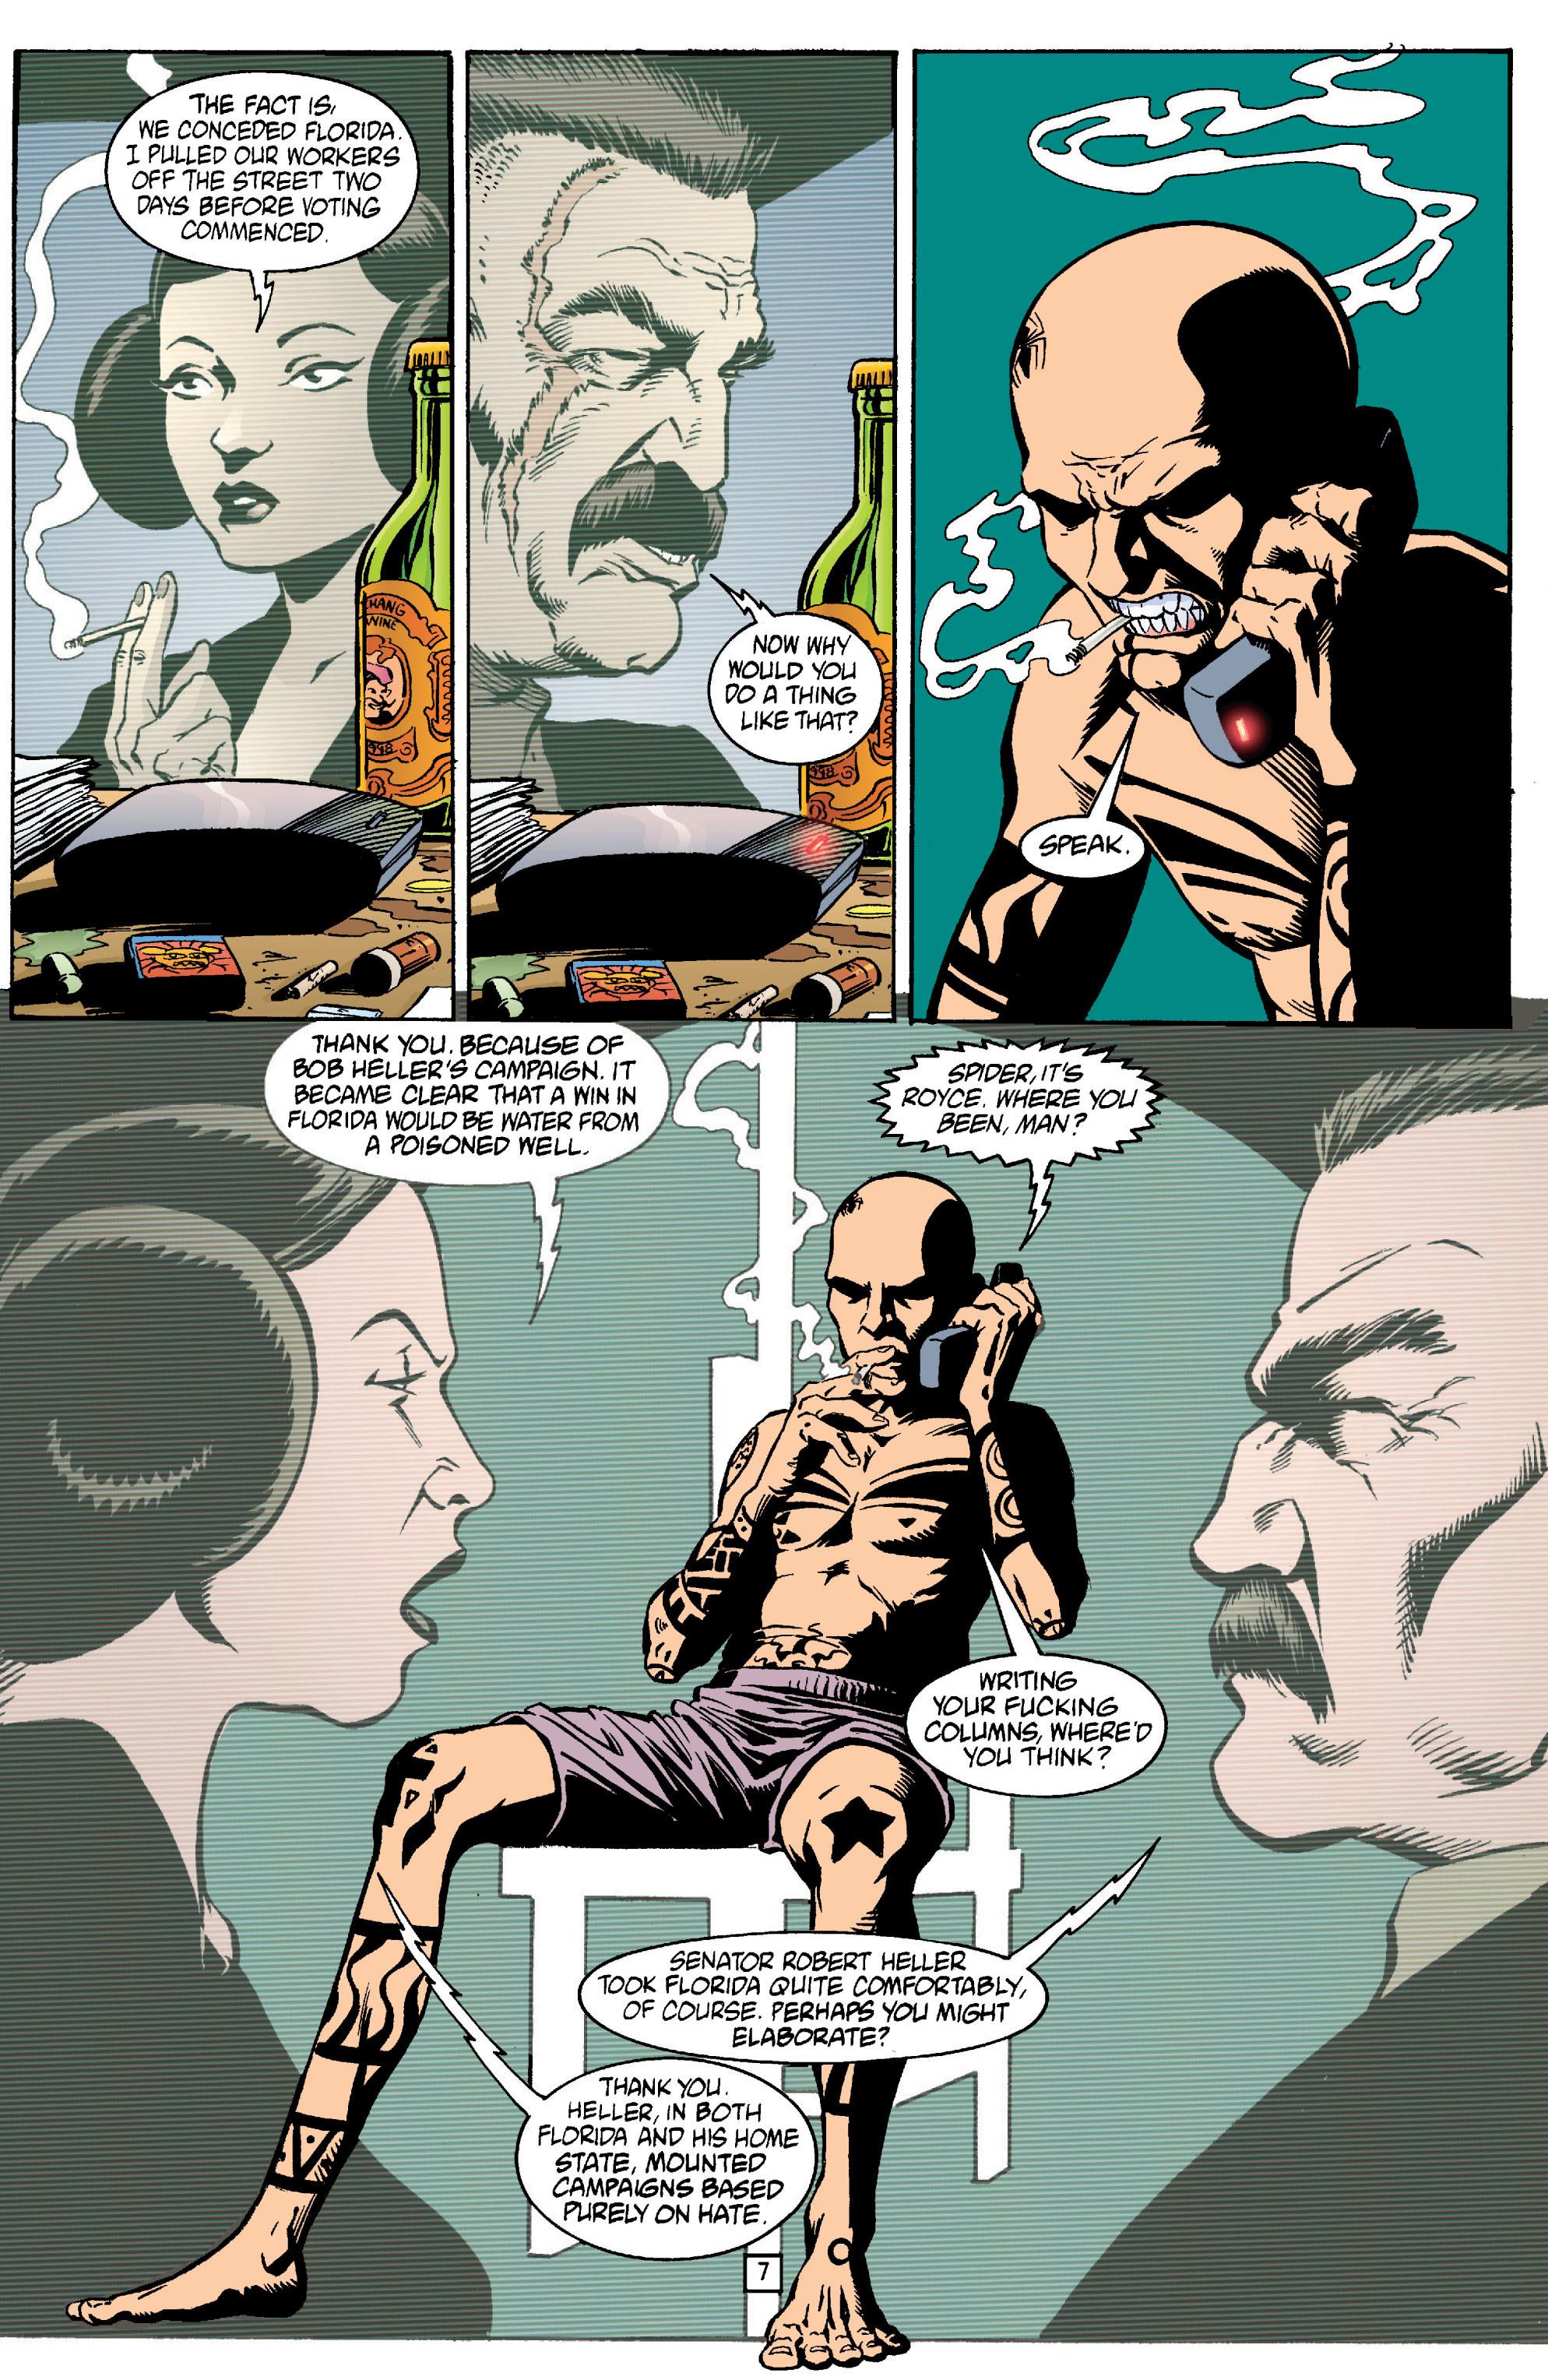 Read online Transmetropolitan comic -  Issue #13 - 8